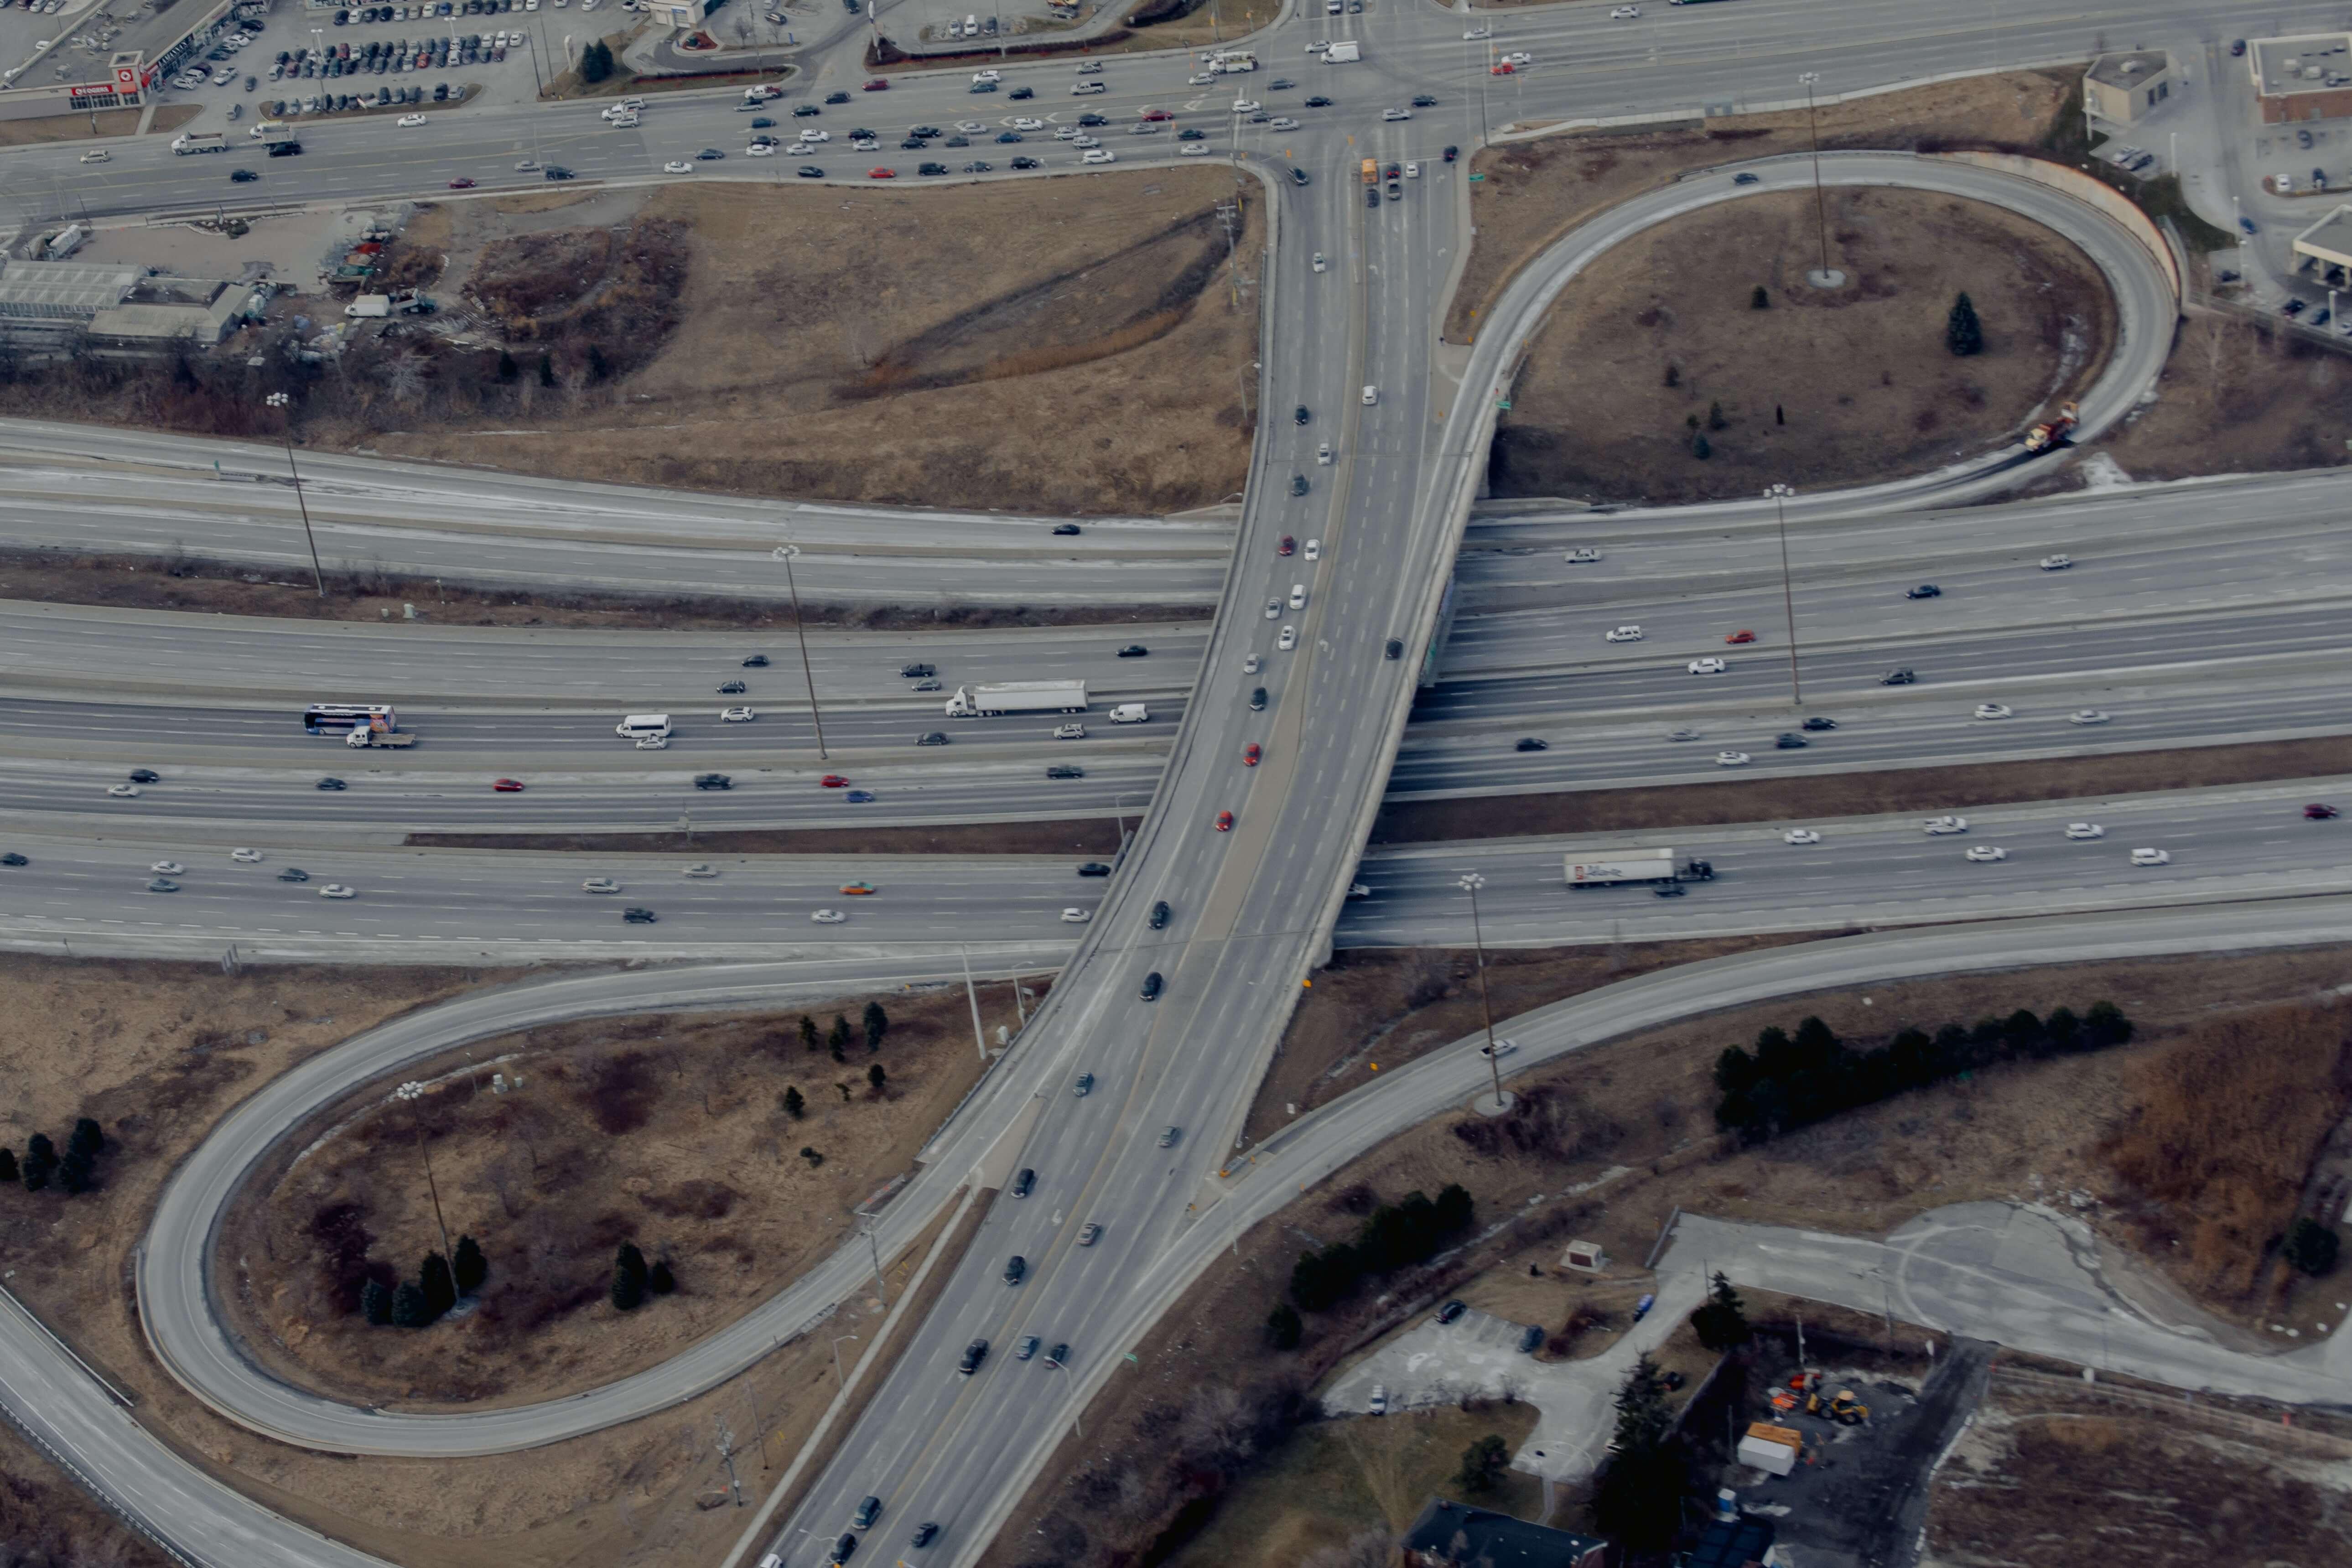 Highway aerial view